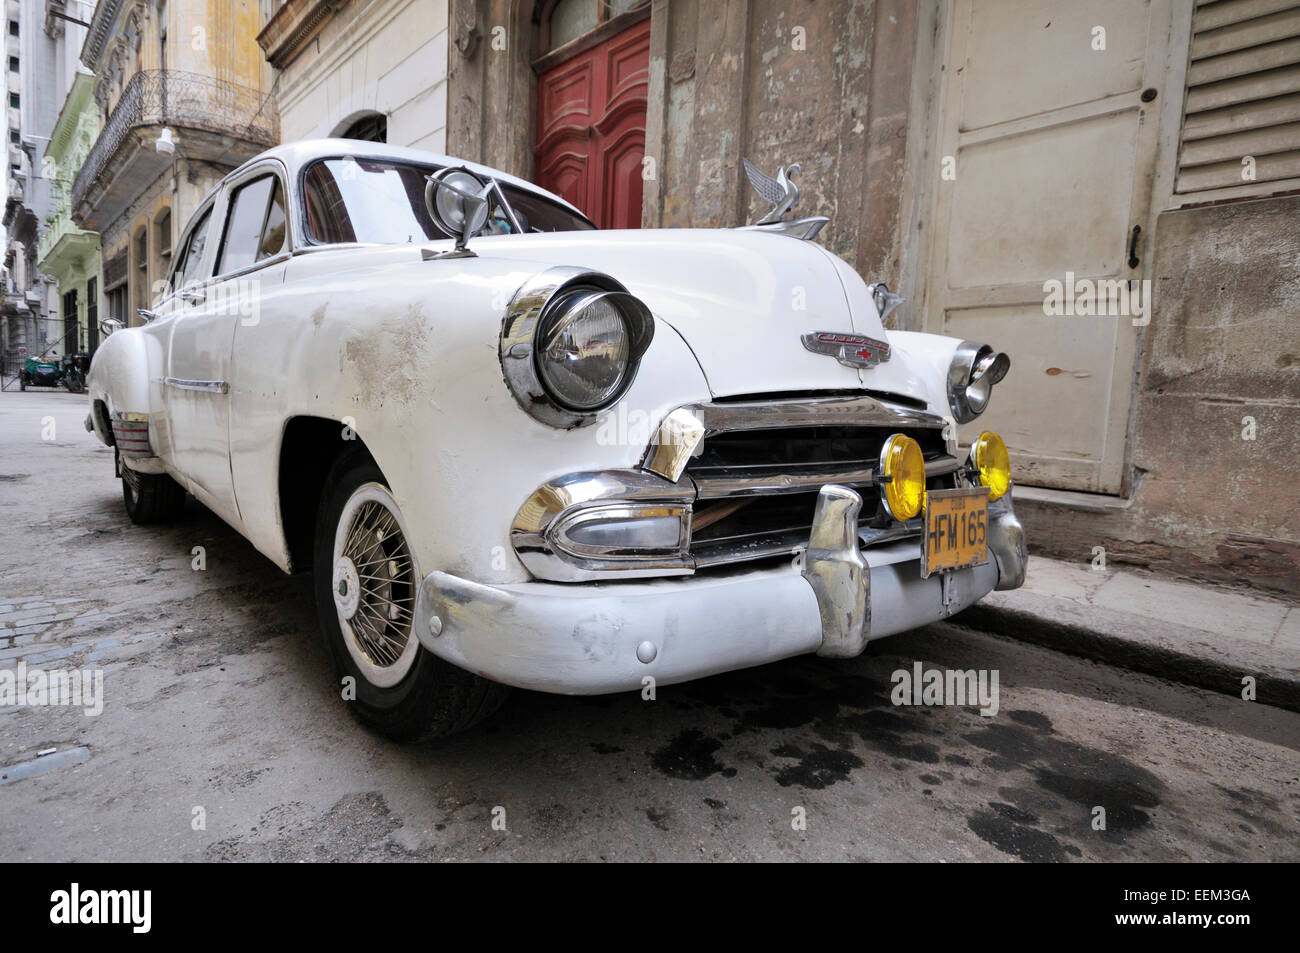 White classic car, historic centre, Havana, Ciudad de La Habana, Cuba - Stock Image